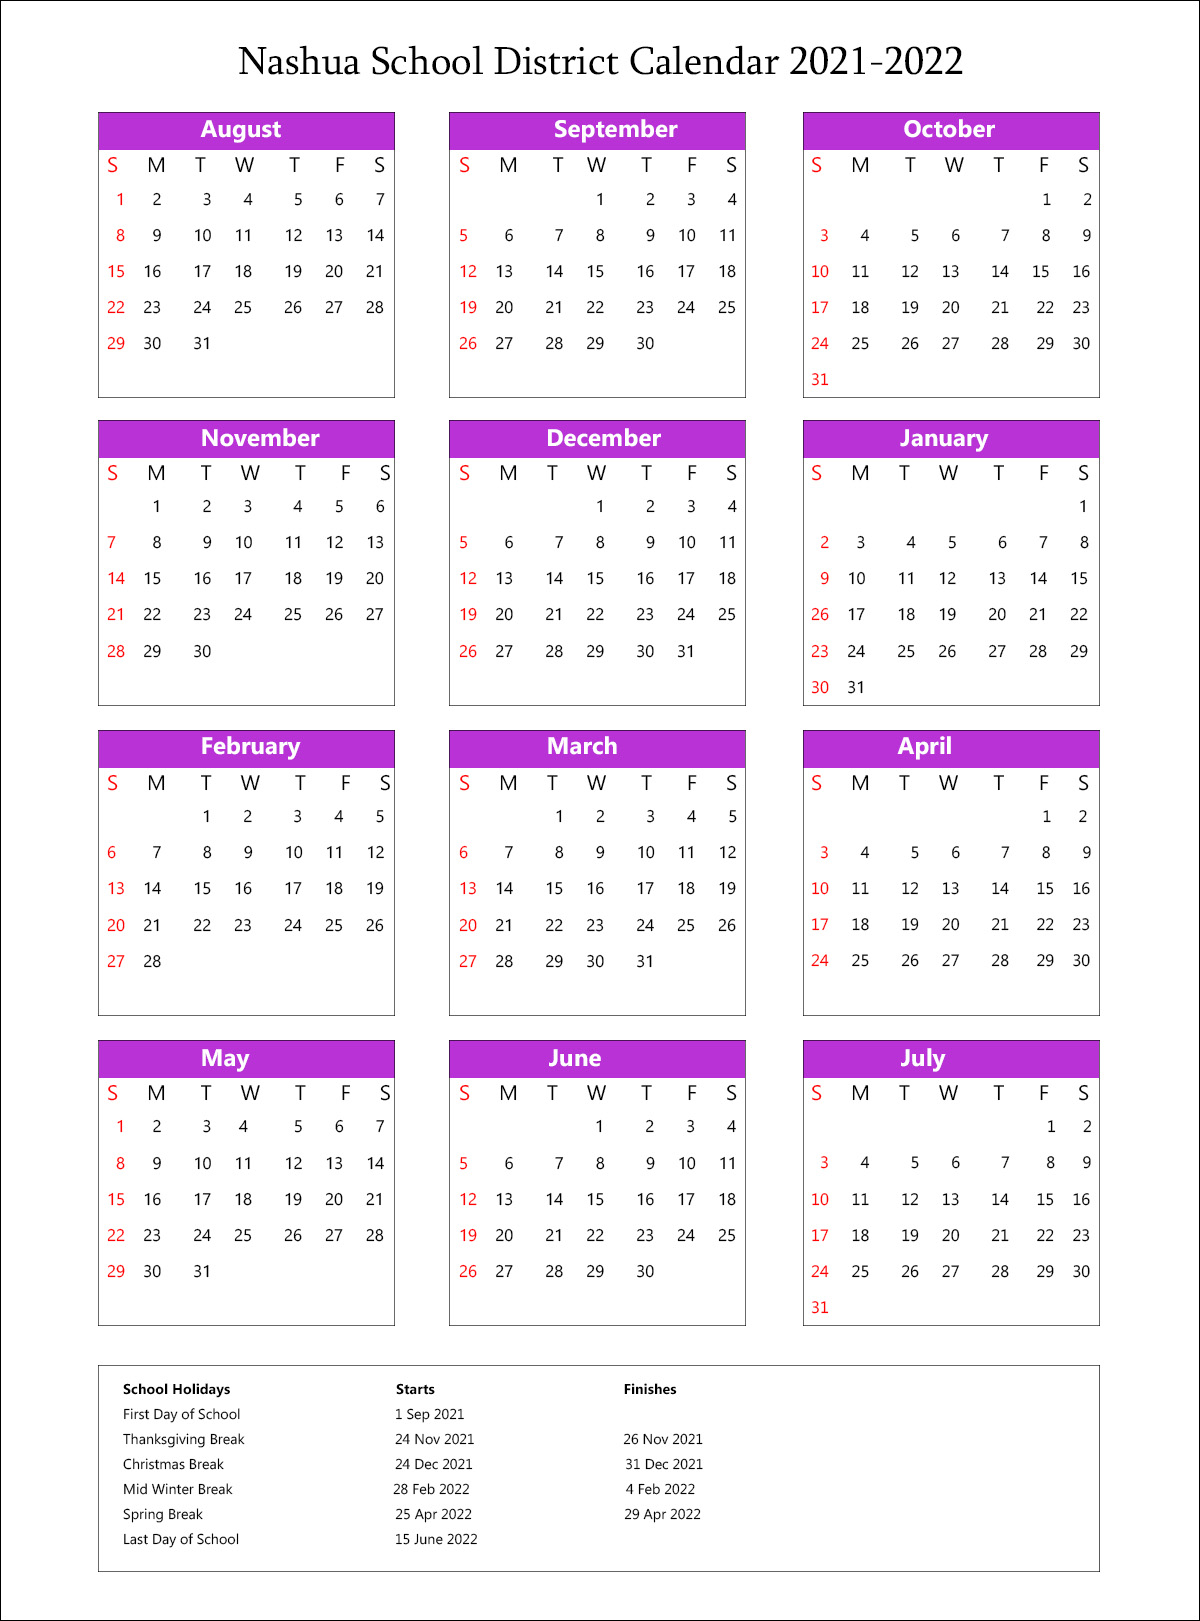 Scps Calendar 2022.Nashua School District Calendar Holidays 2021 2022